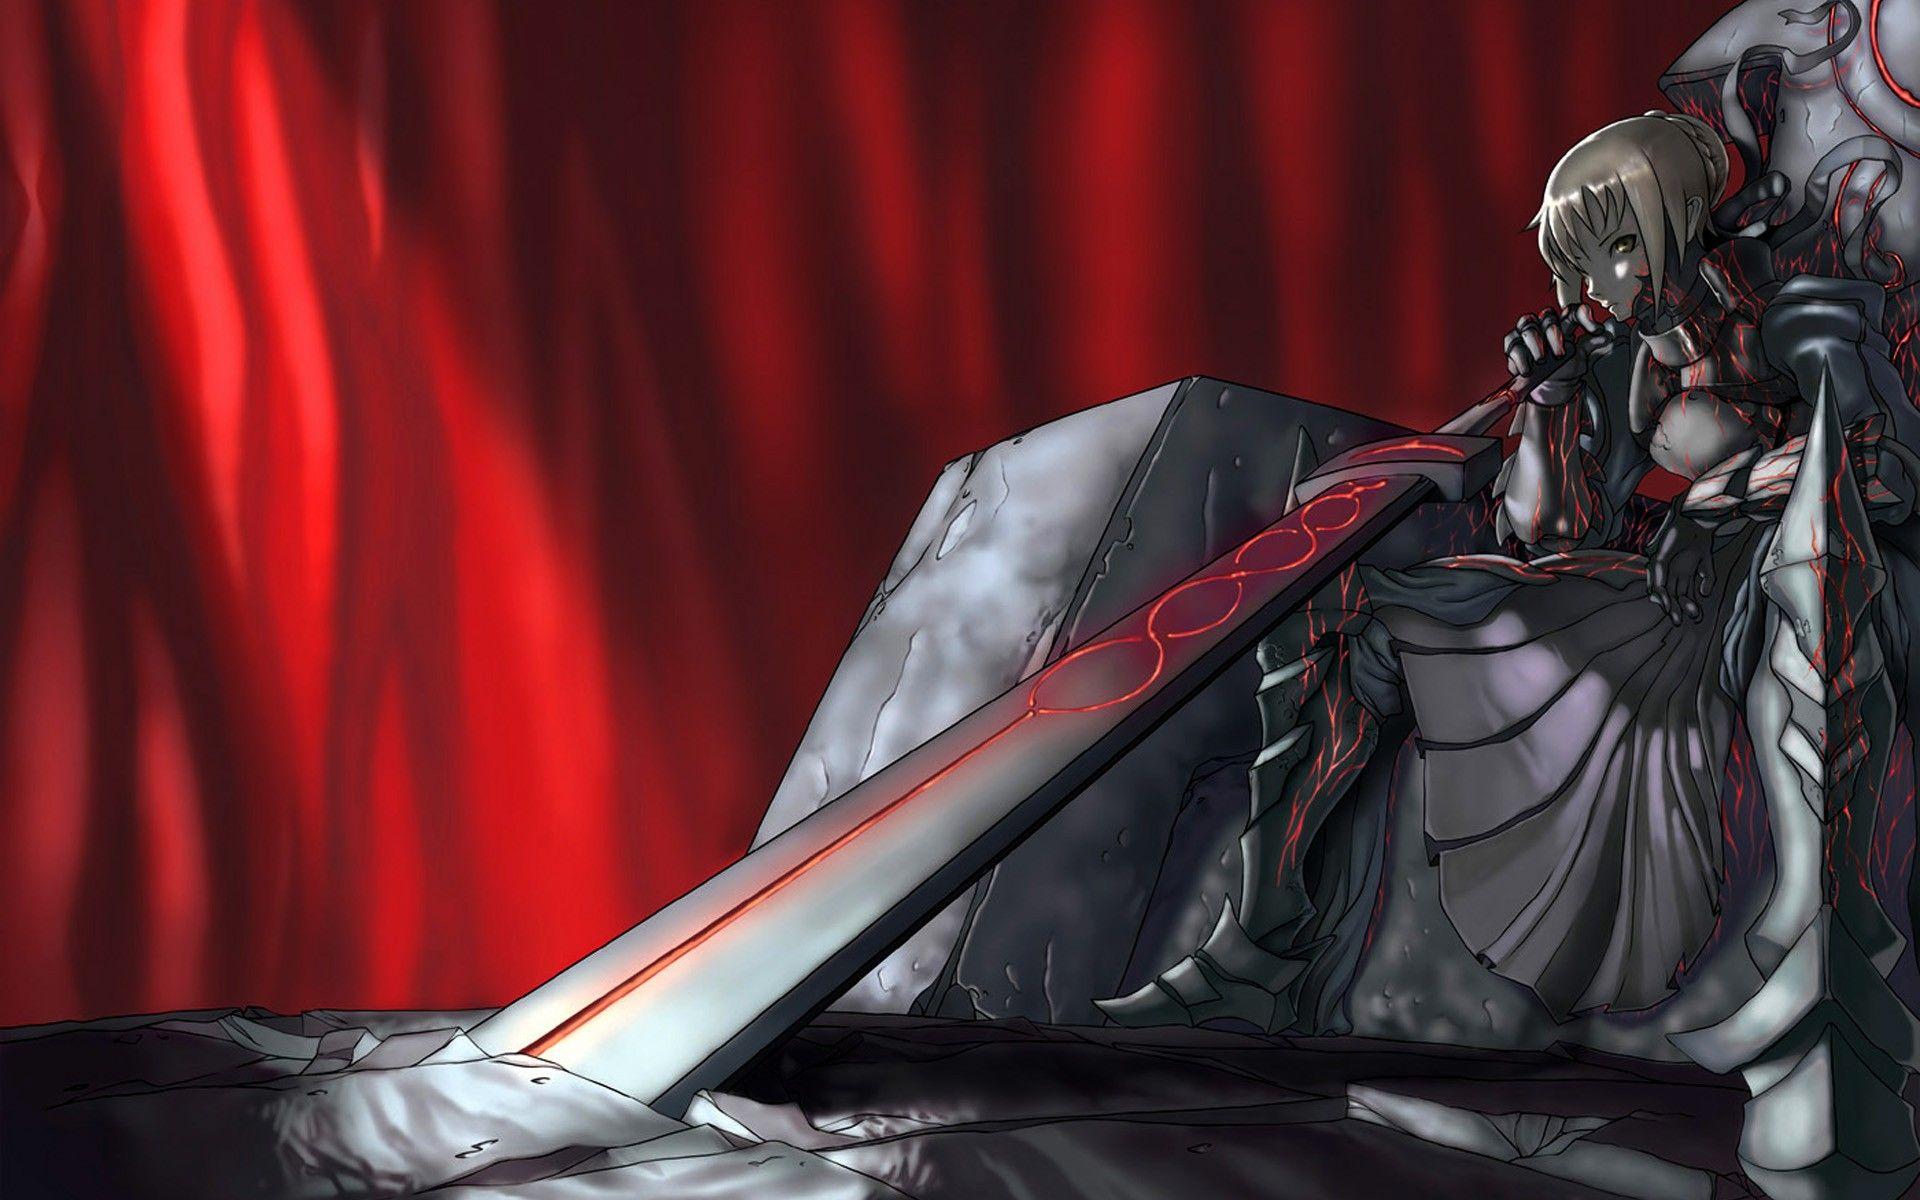 Anime 1920x1200 Fate Series Saber dark Saber Alter armor